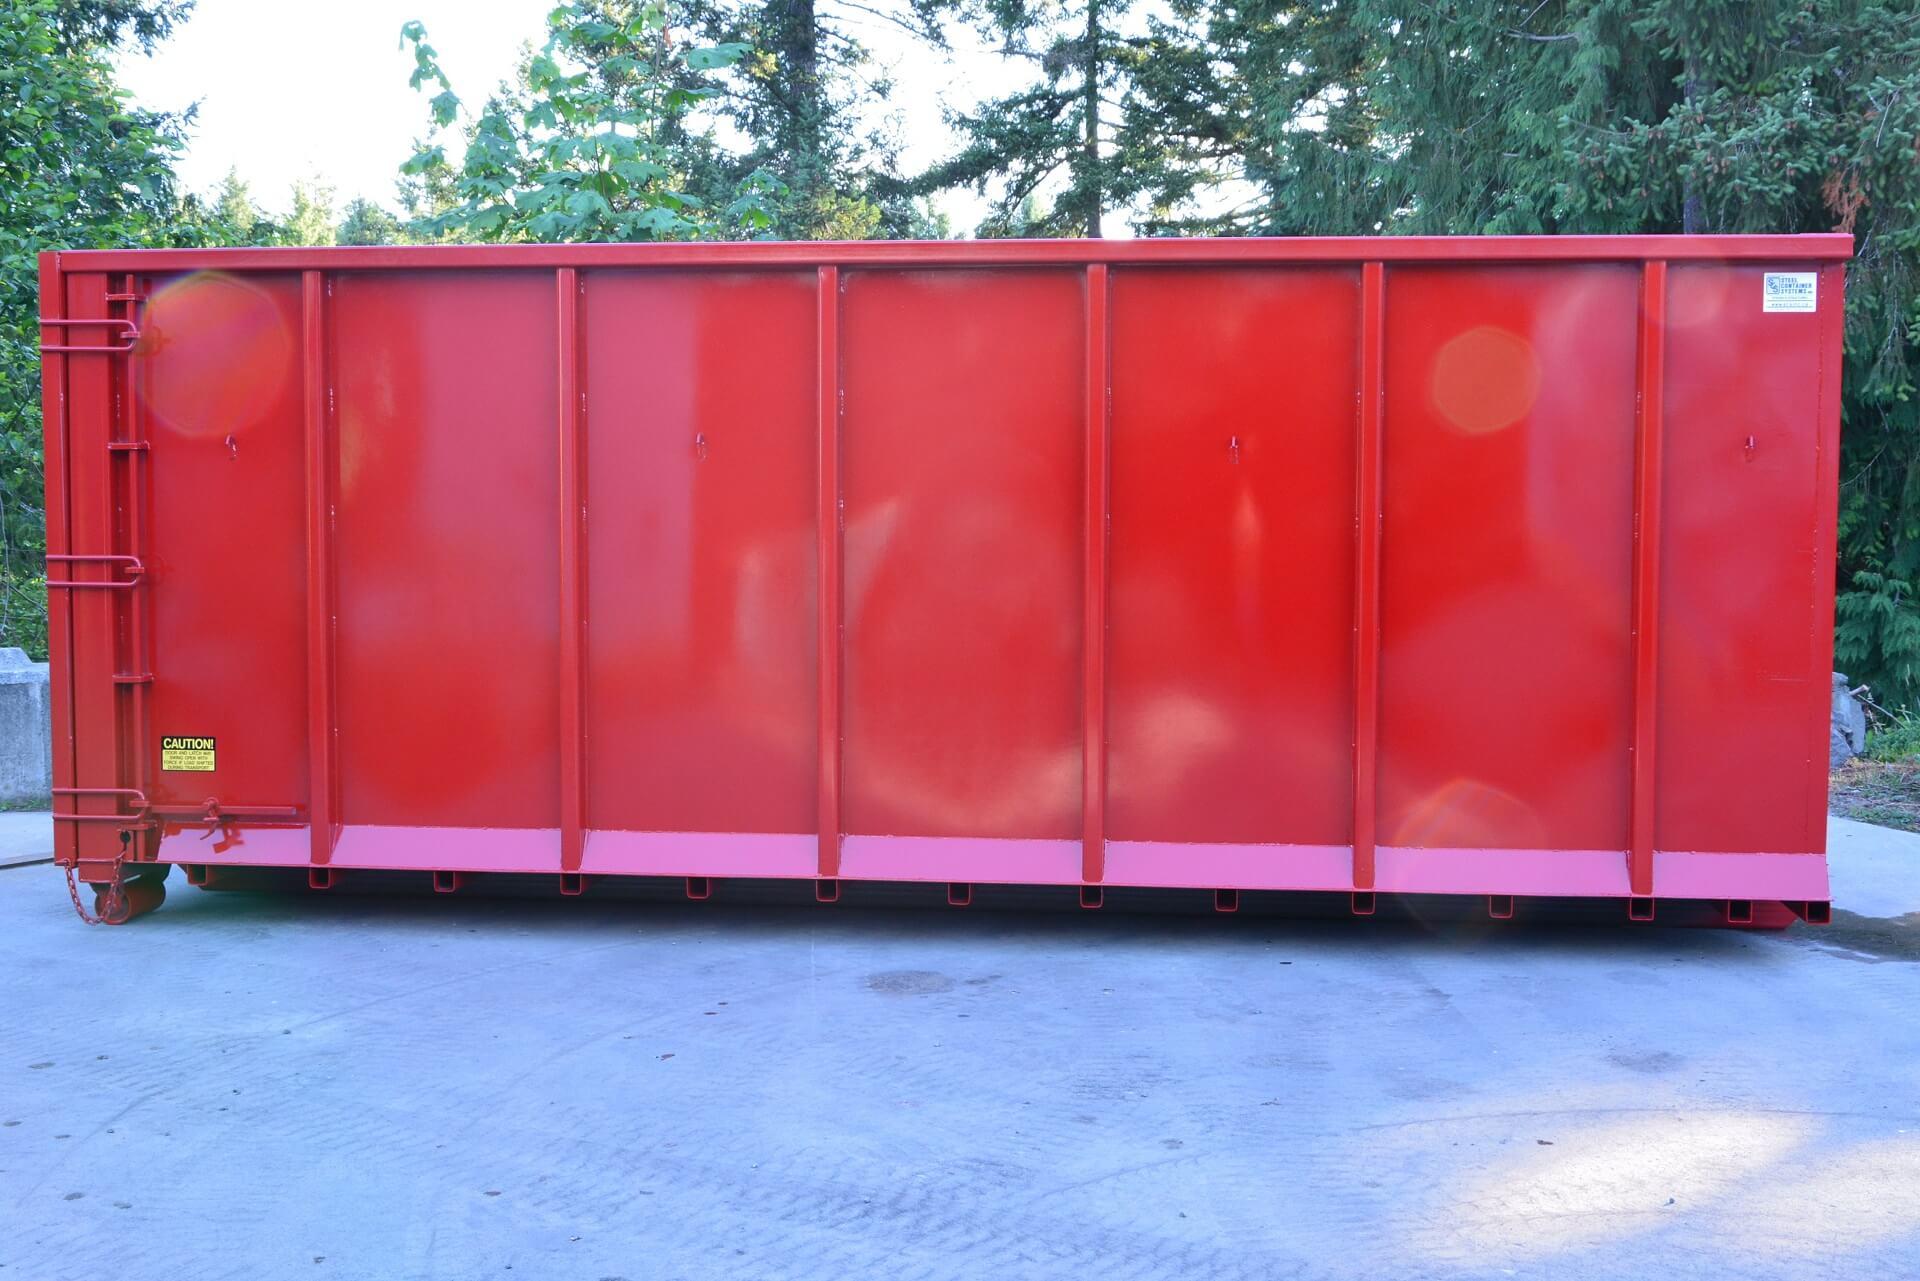 20 Cubic Yard Dumpster-Colorado's Premier Dumpster Rental Services